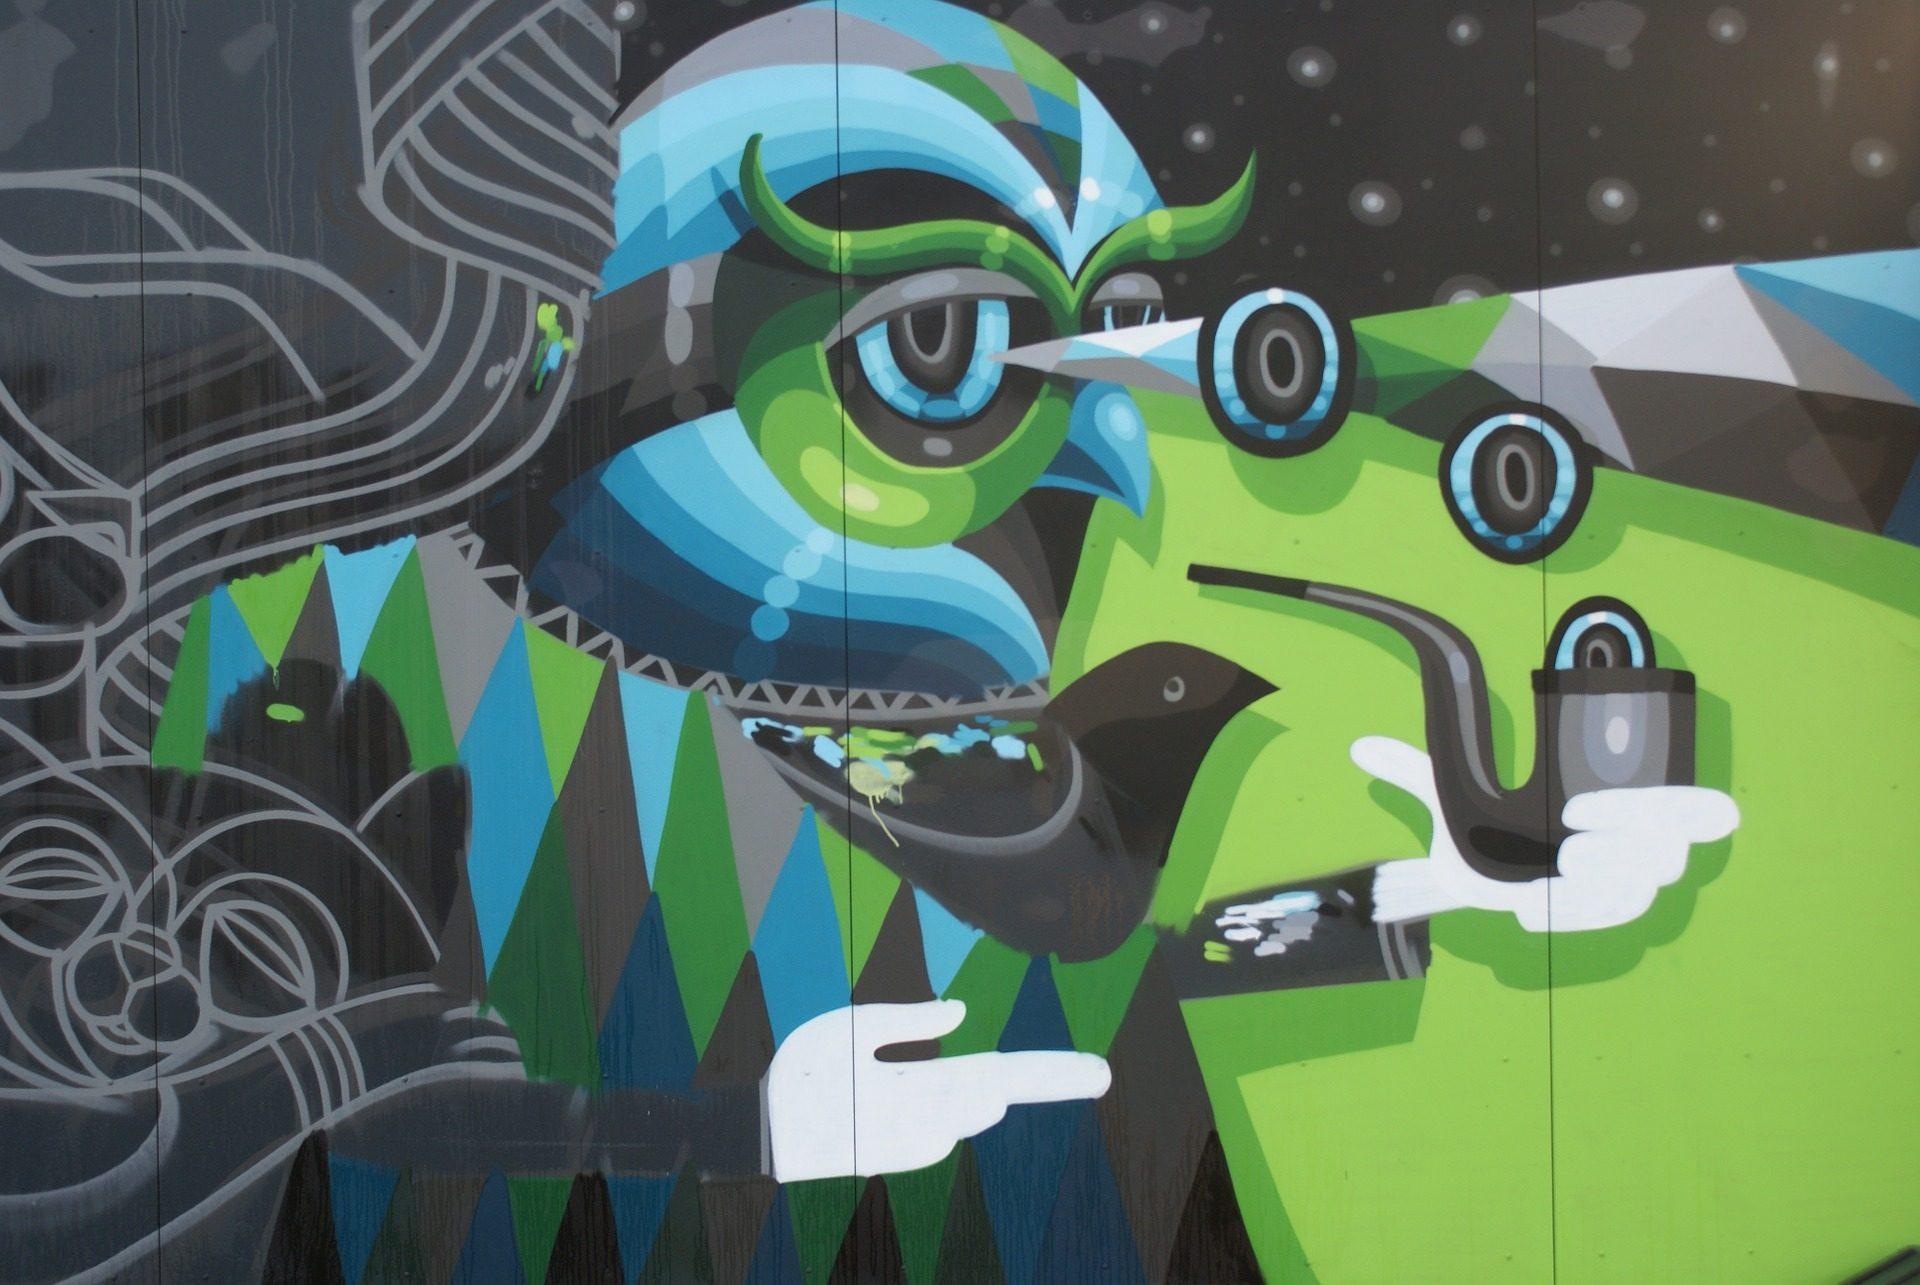 Graffiti, peinture, dessin, art, Rue, pared, Mur - Fonds d'écran HD - Professor-falken.com